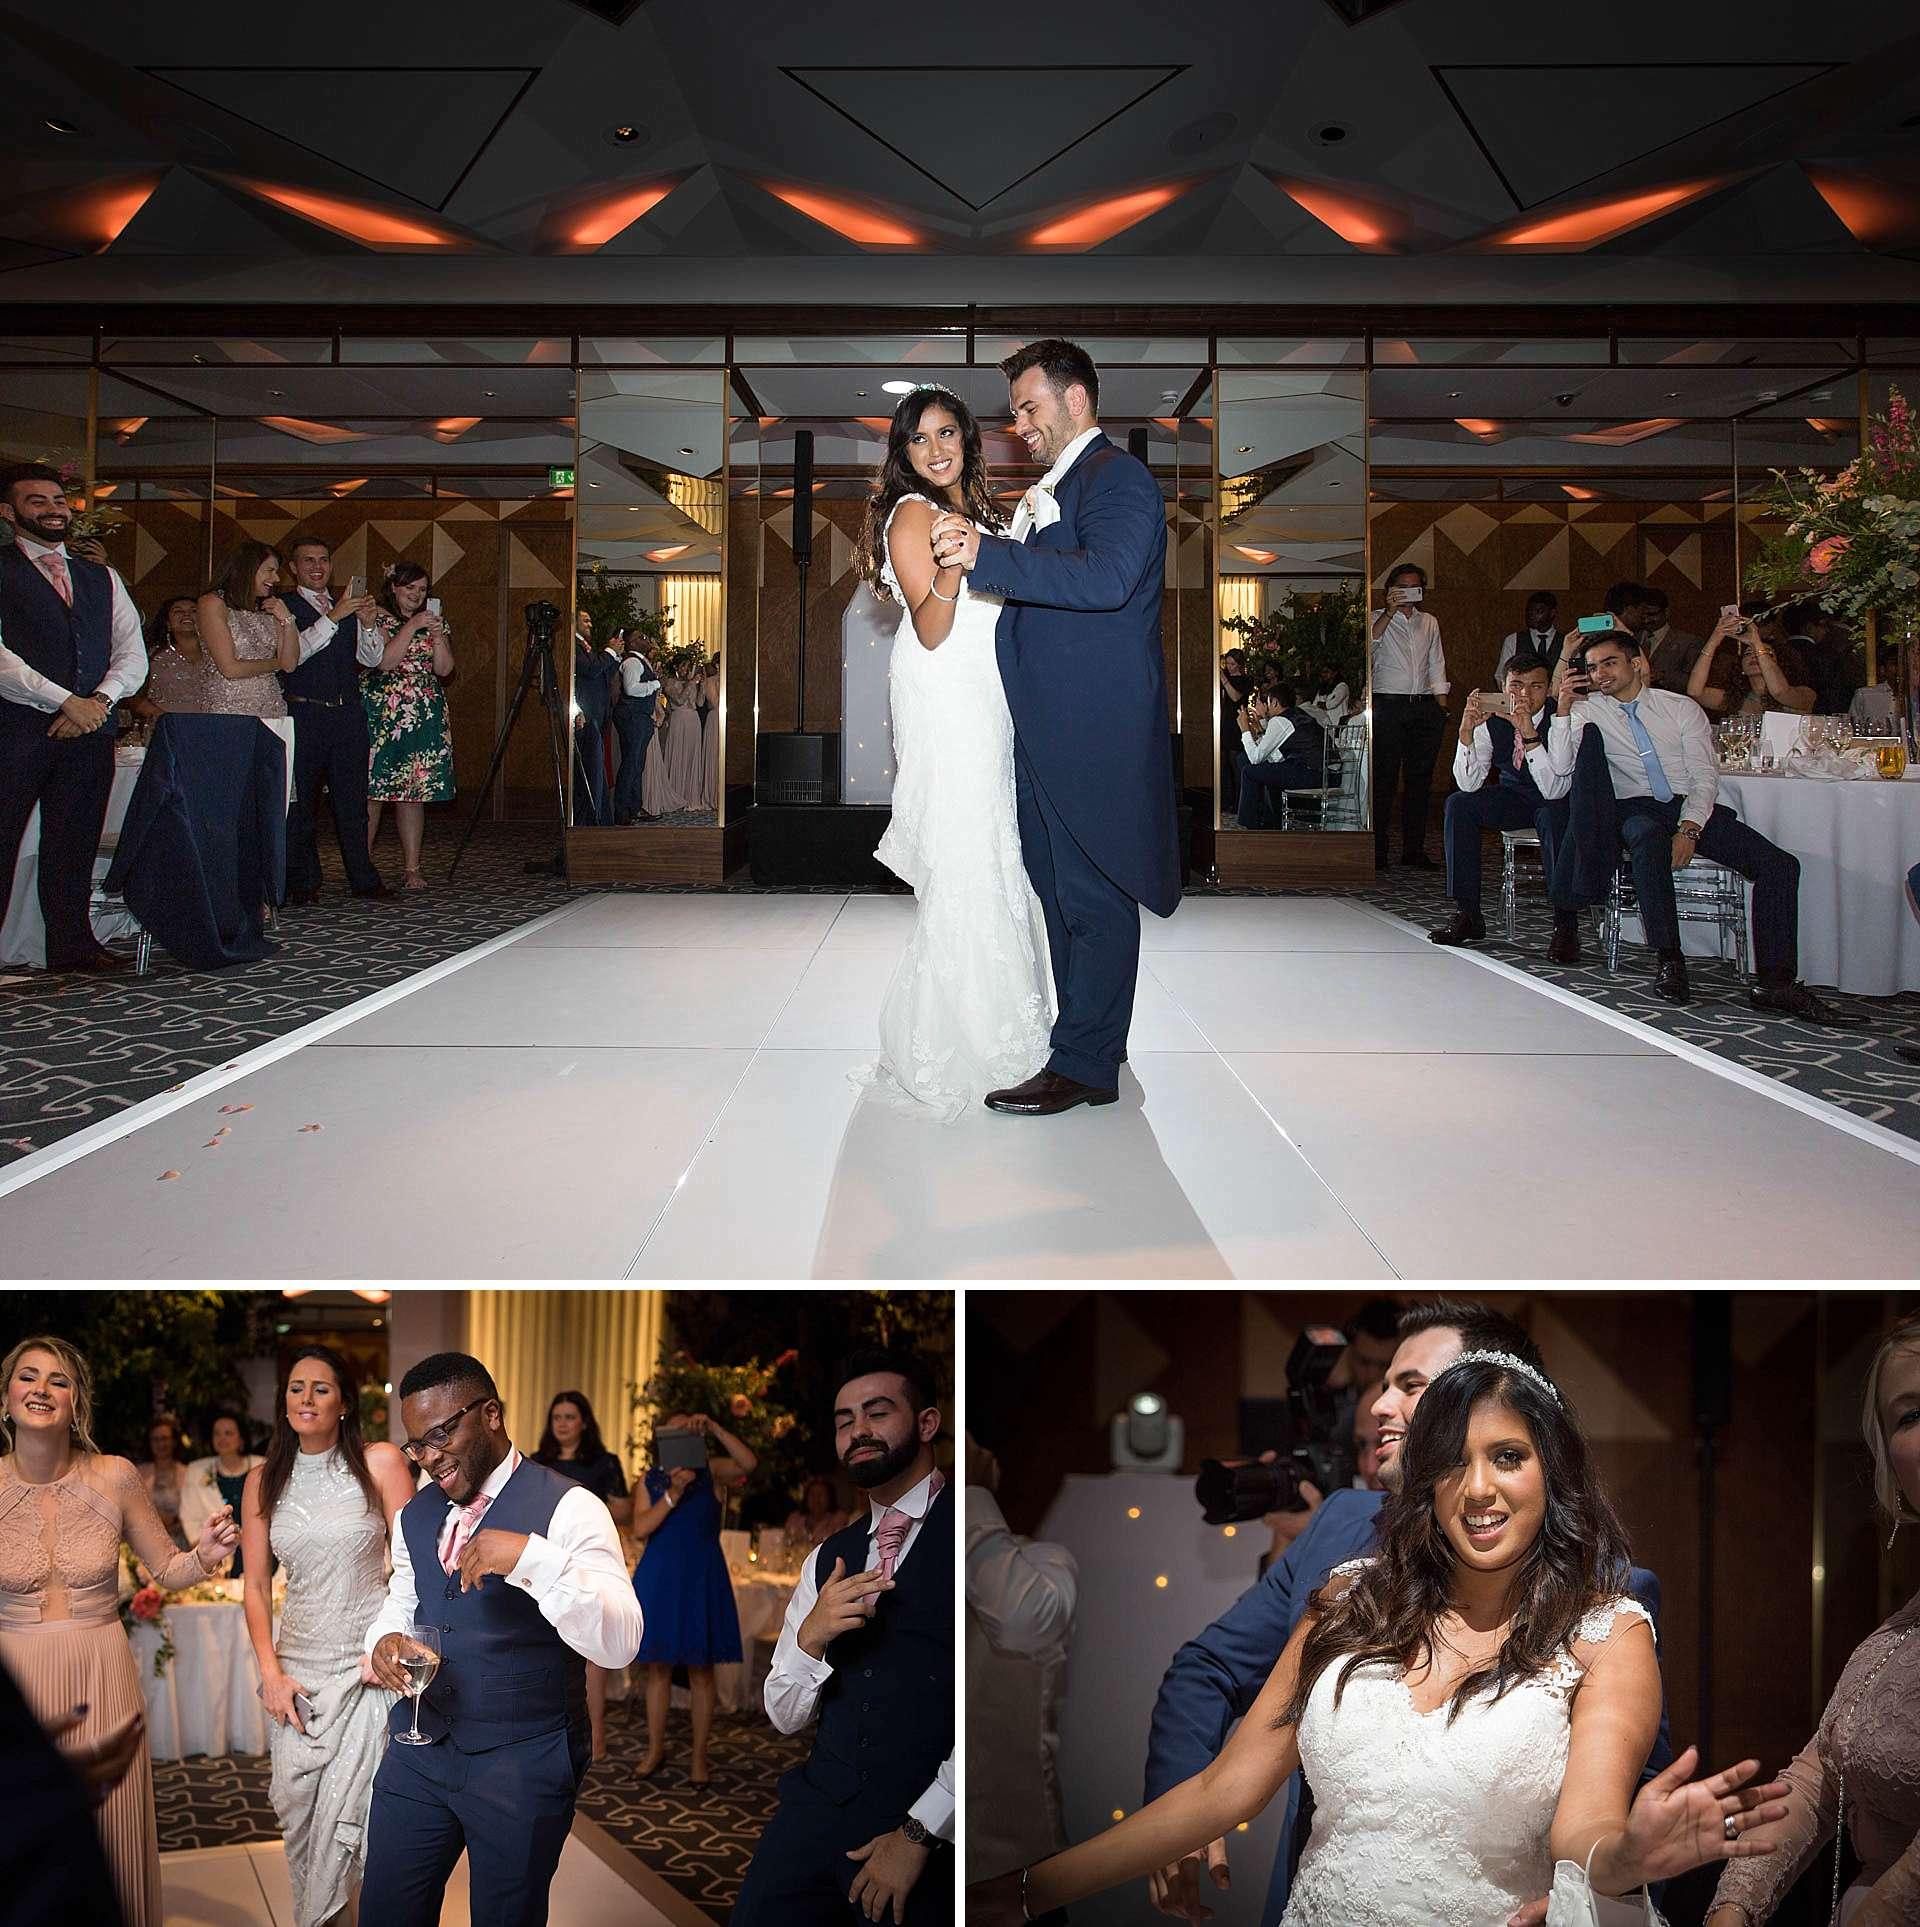 Wedding reception at The Berkeley